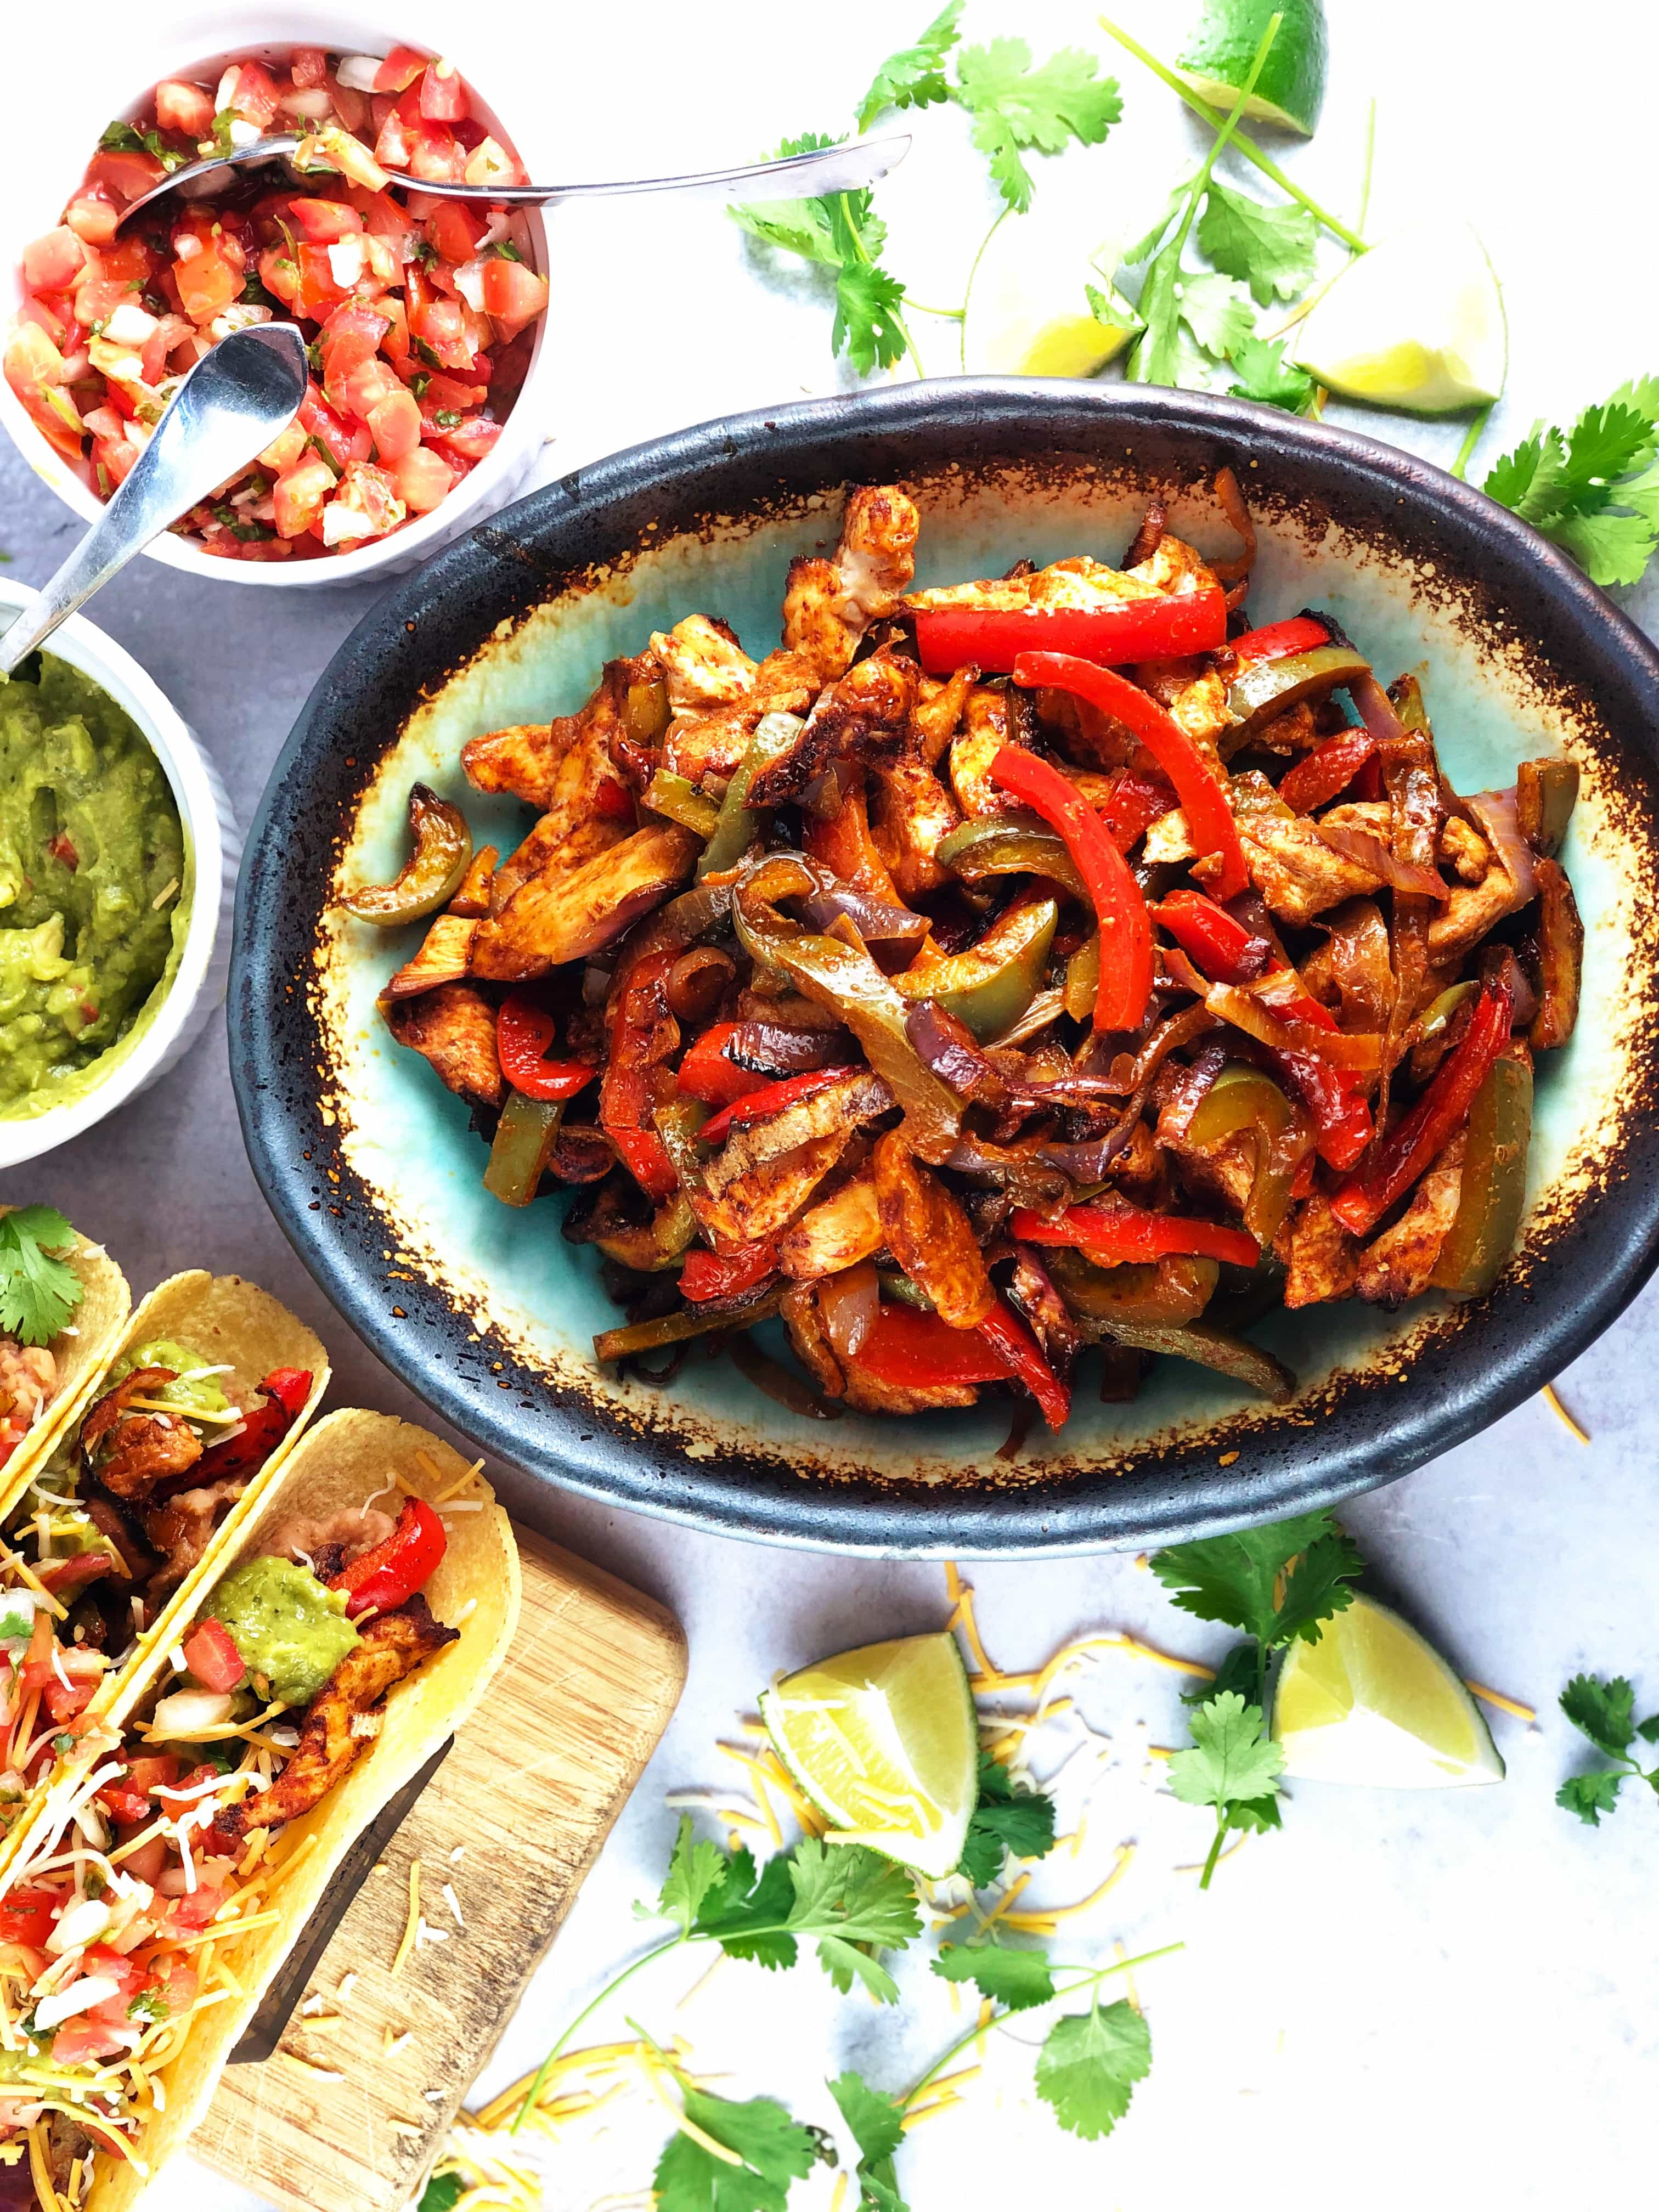 Sheet Pan Fajitas with lime and cilantro